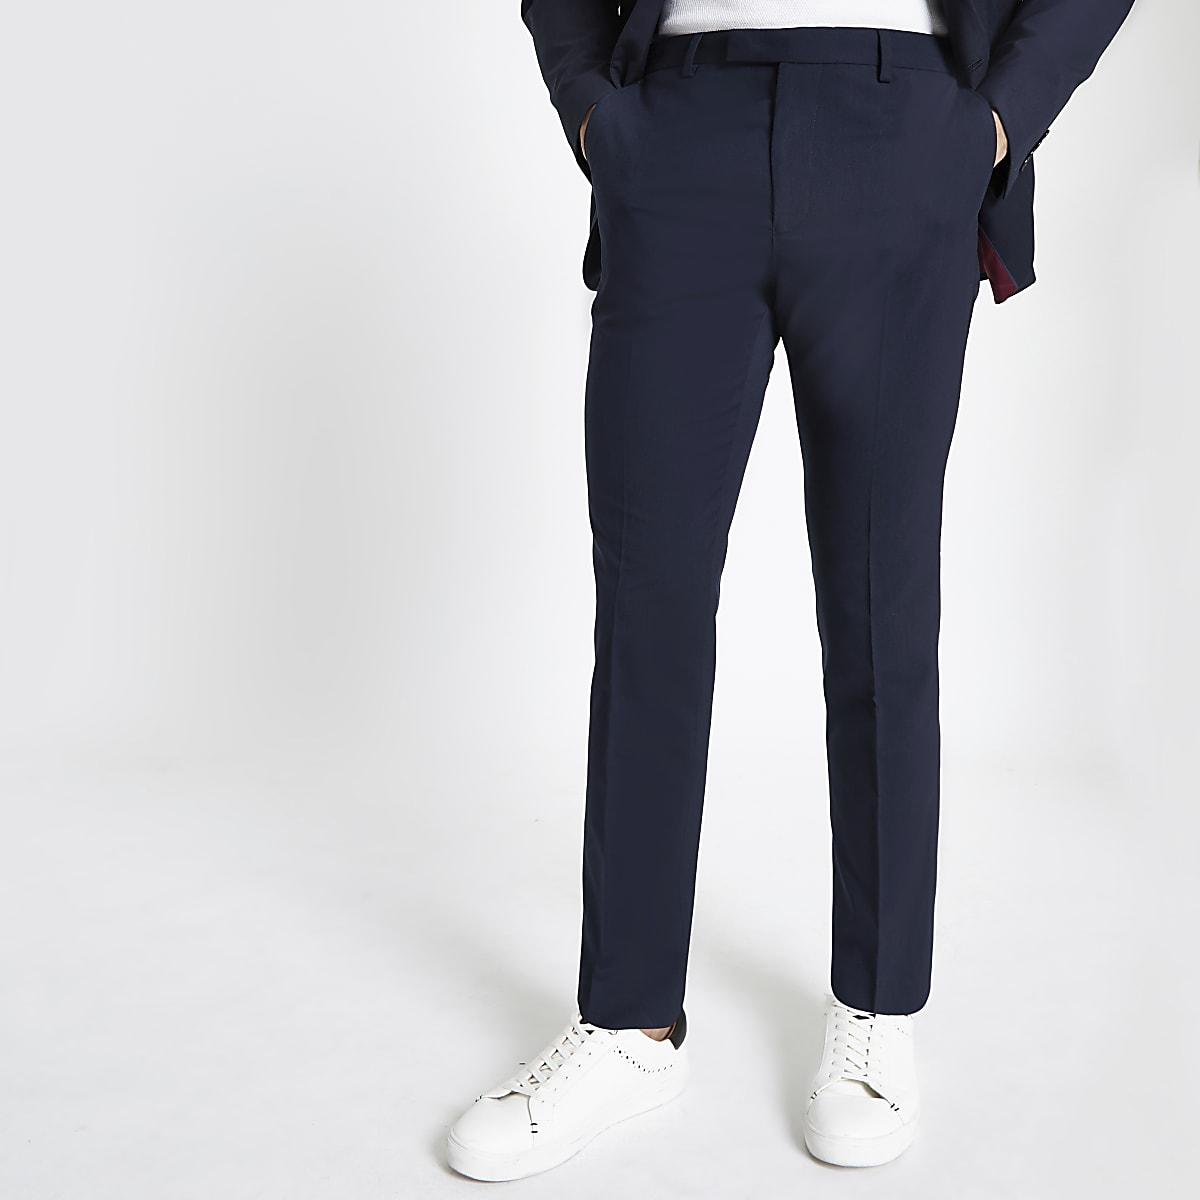 Marineblaue Anzughose in Slim Fit